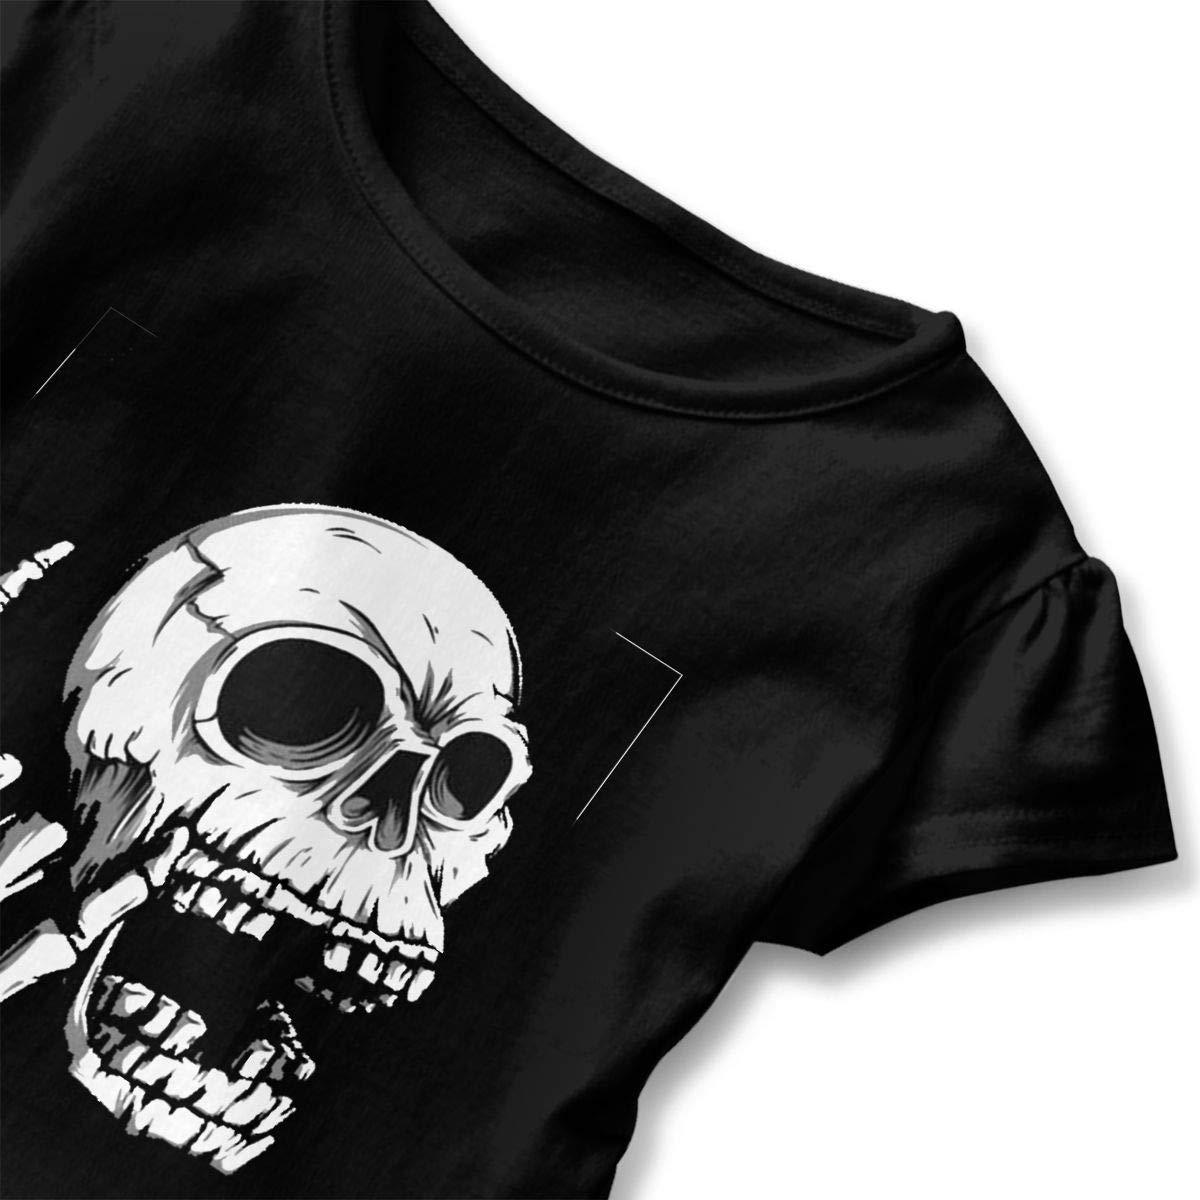 lu fangfangc Rock Skulls T-Shirt Toddler Girls Flounced T Shirts Cartoon Outfits for 2-6T Kids Girls